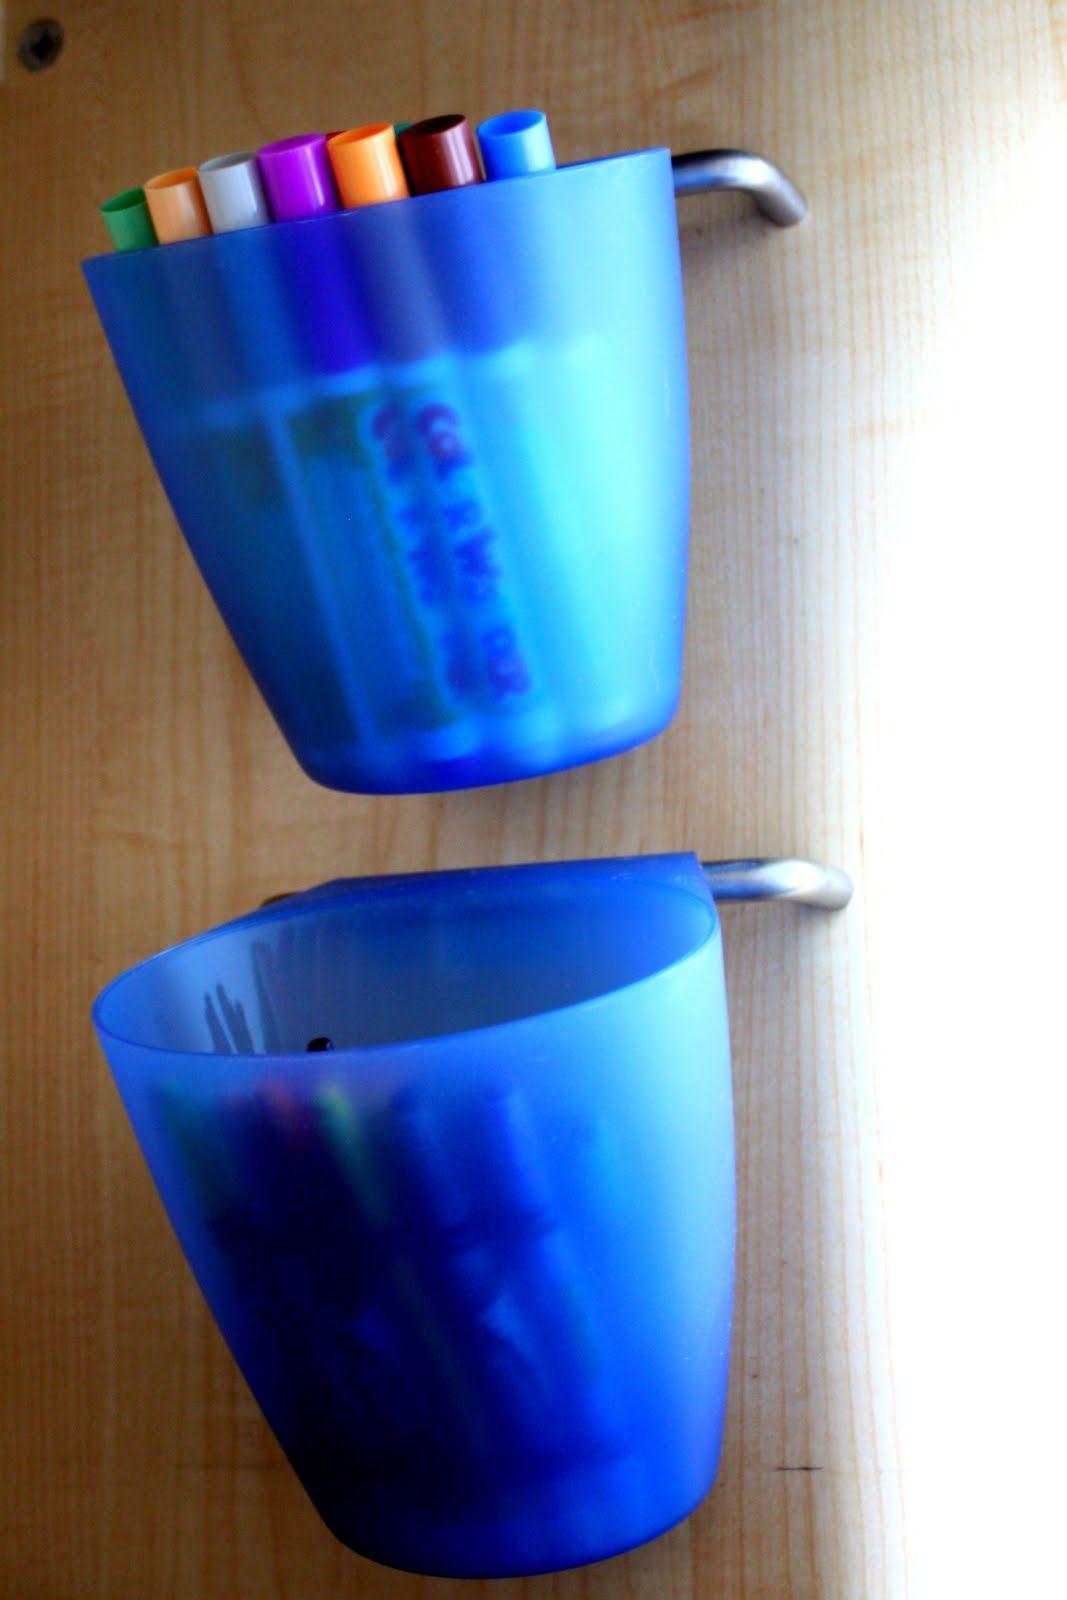 Ikea Buckets And Handles For Art Supply Storage Art